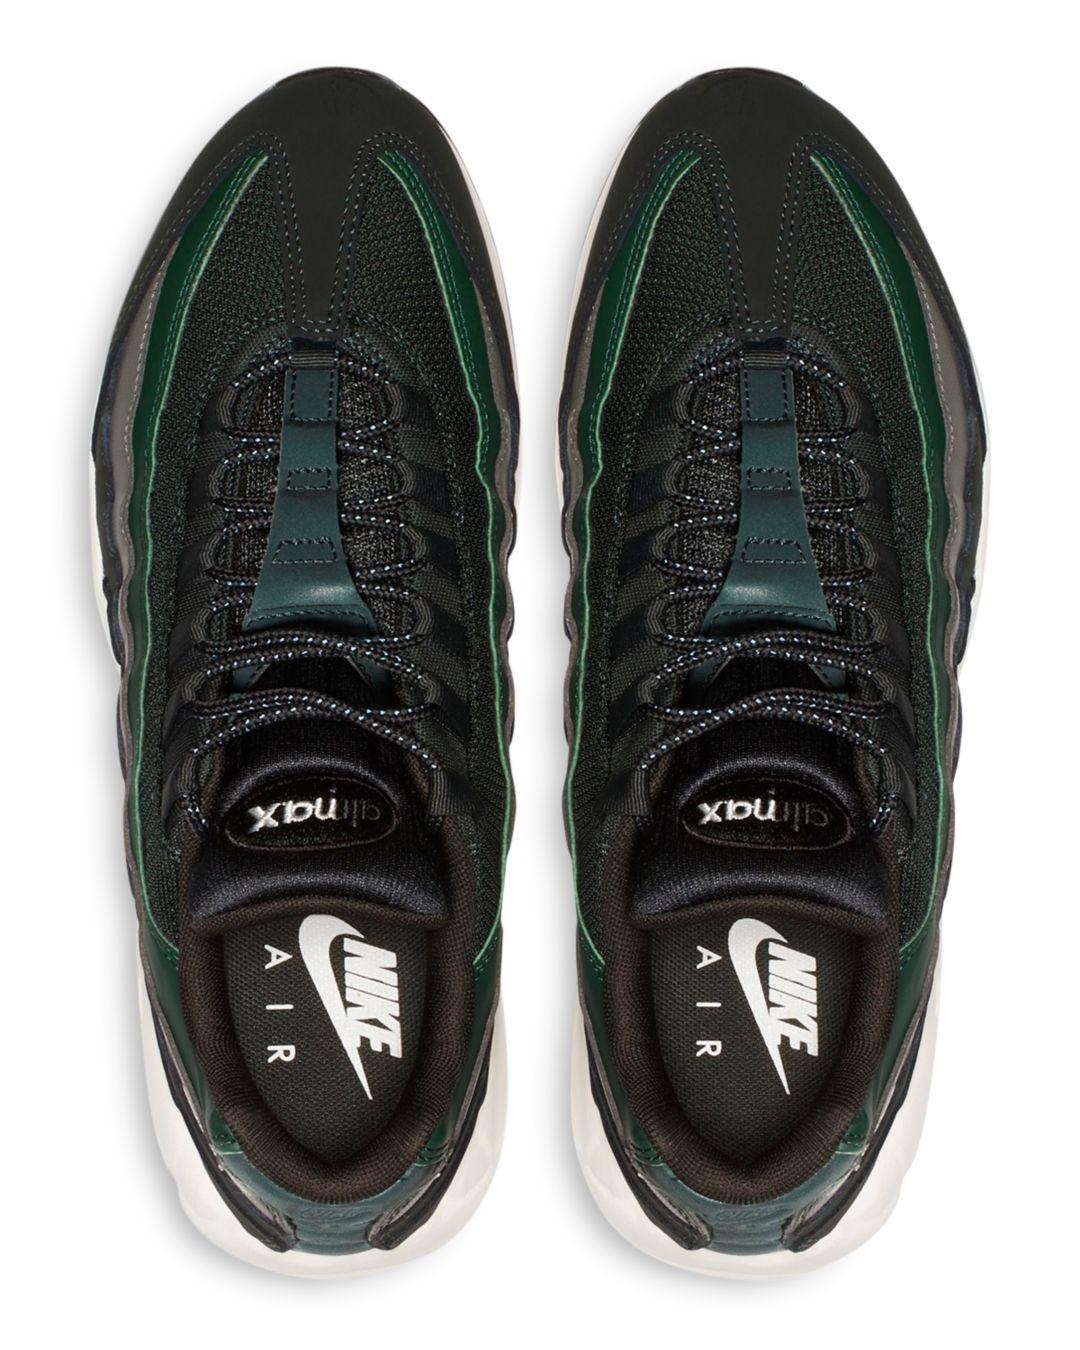 reputable site 8fde7 02e56 Nike Air Max 95 Essential Outdoor Green  Sail-fir-vintage Lichen in Green  for Men - Save 14% - Lyst